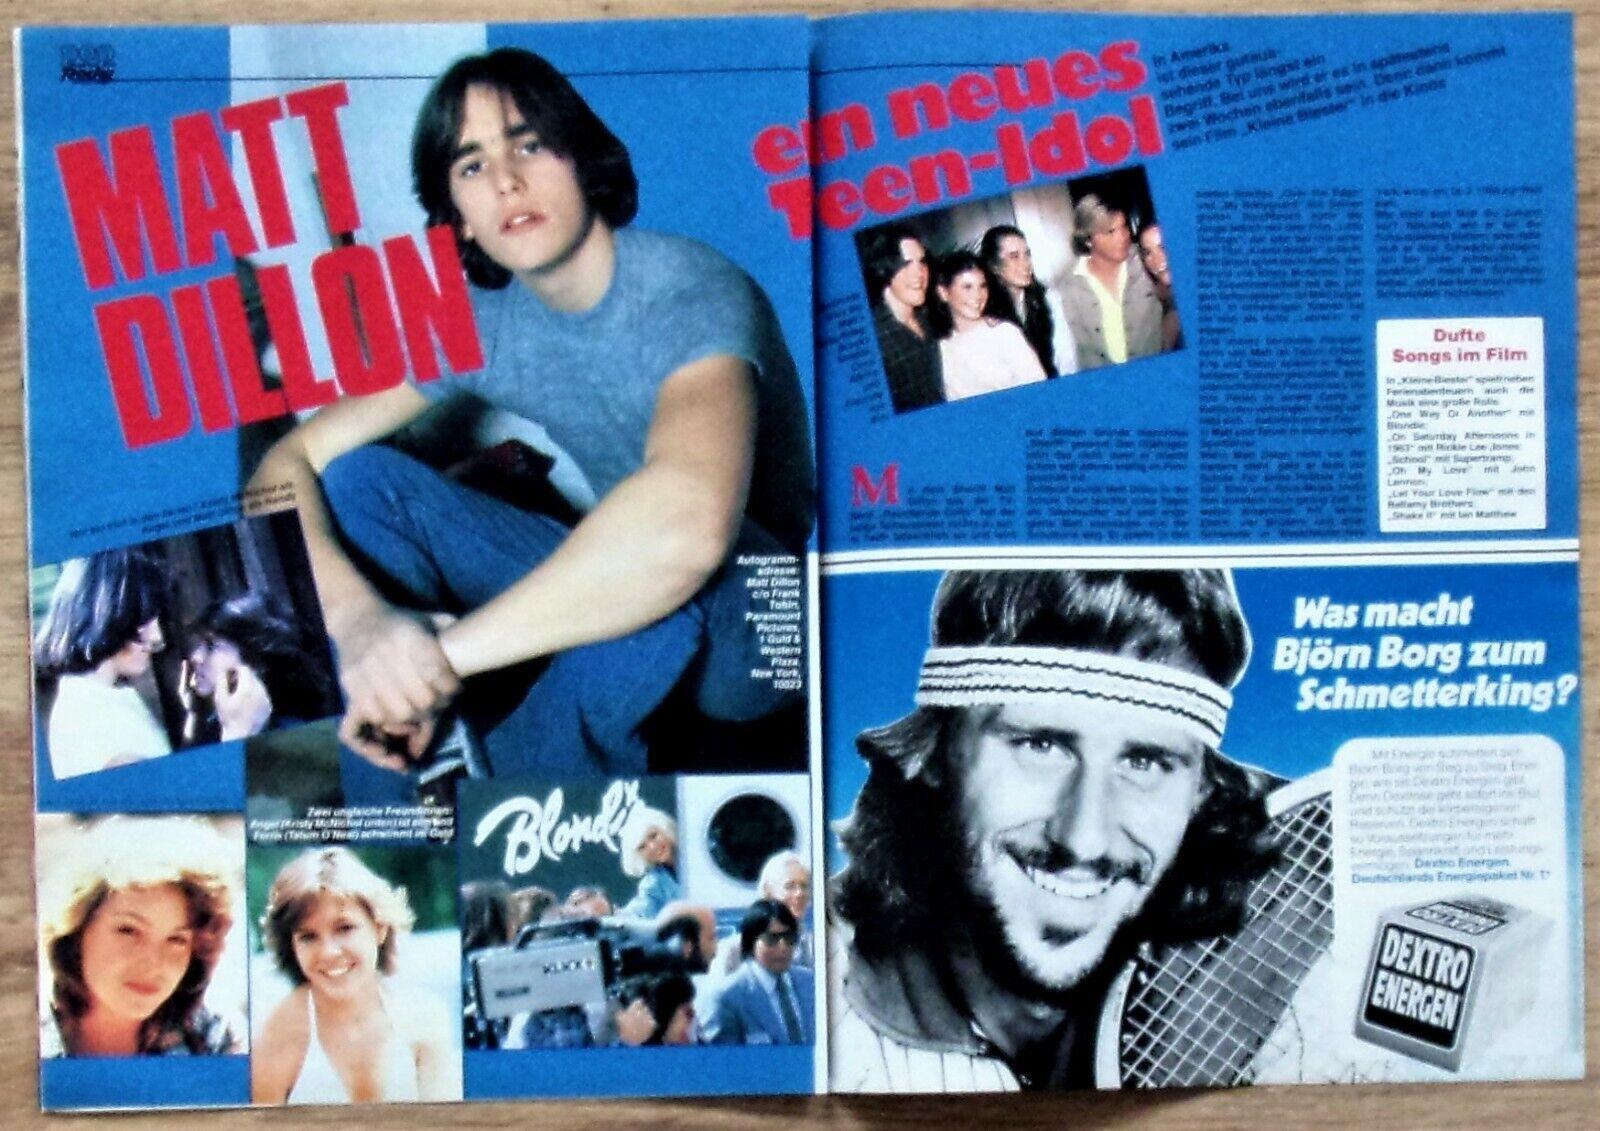 MATT DILLON - Bericht - Teen-Idol 80er Jahre rare 80s clipping SAUBER ENTNOMMEN!